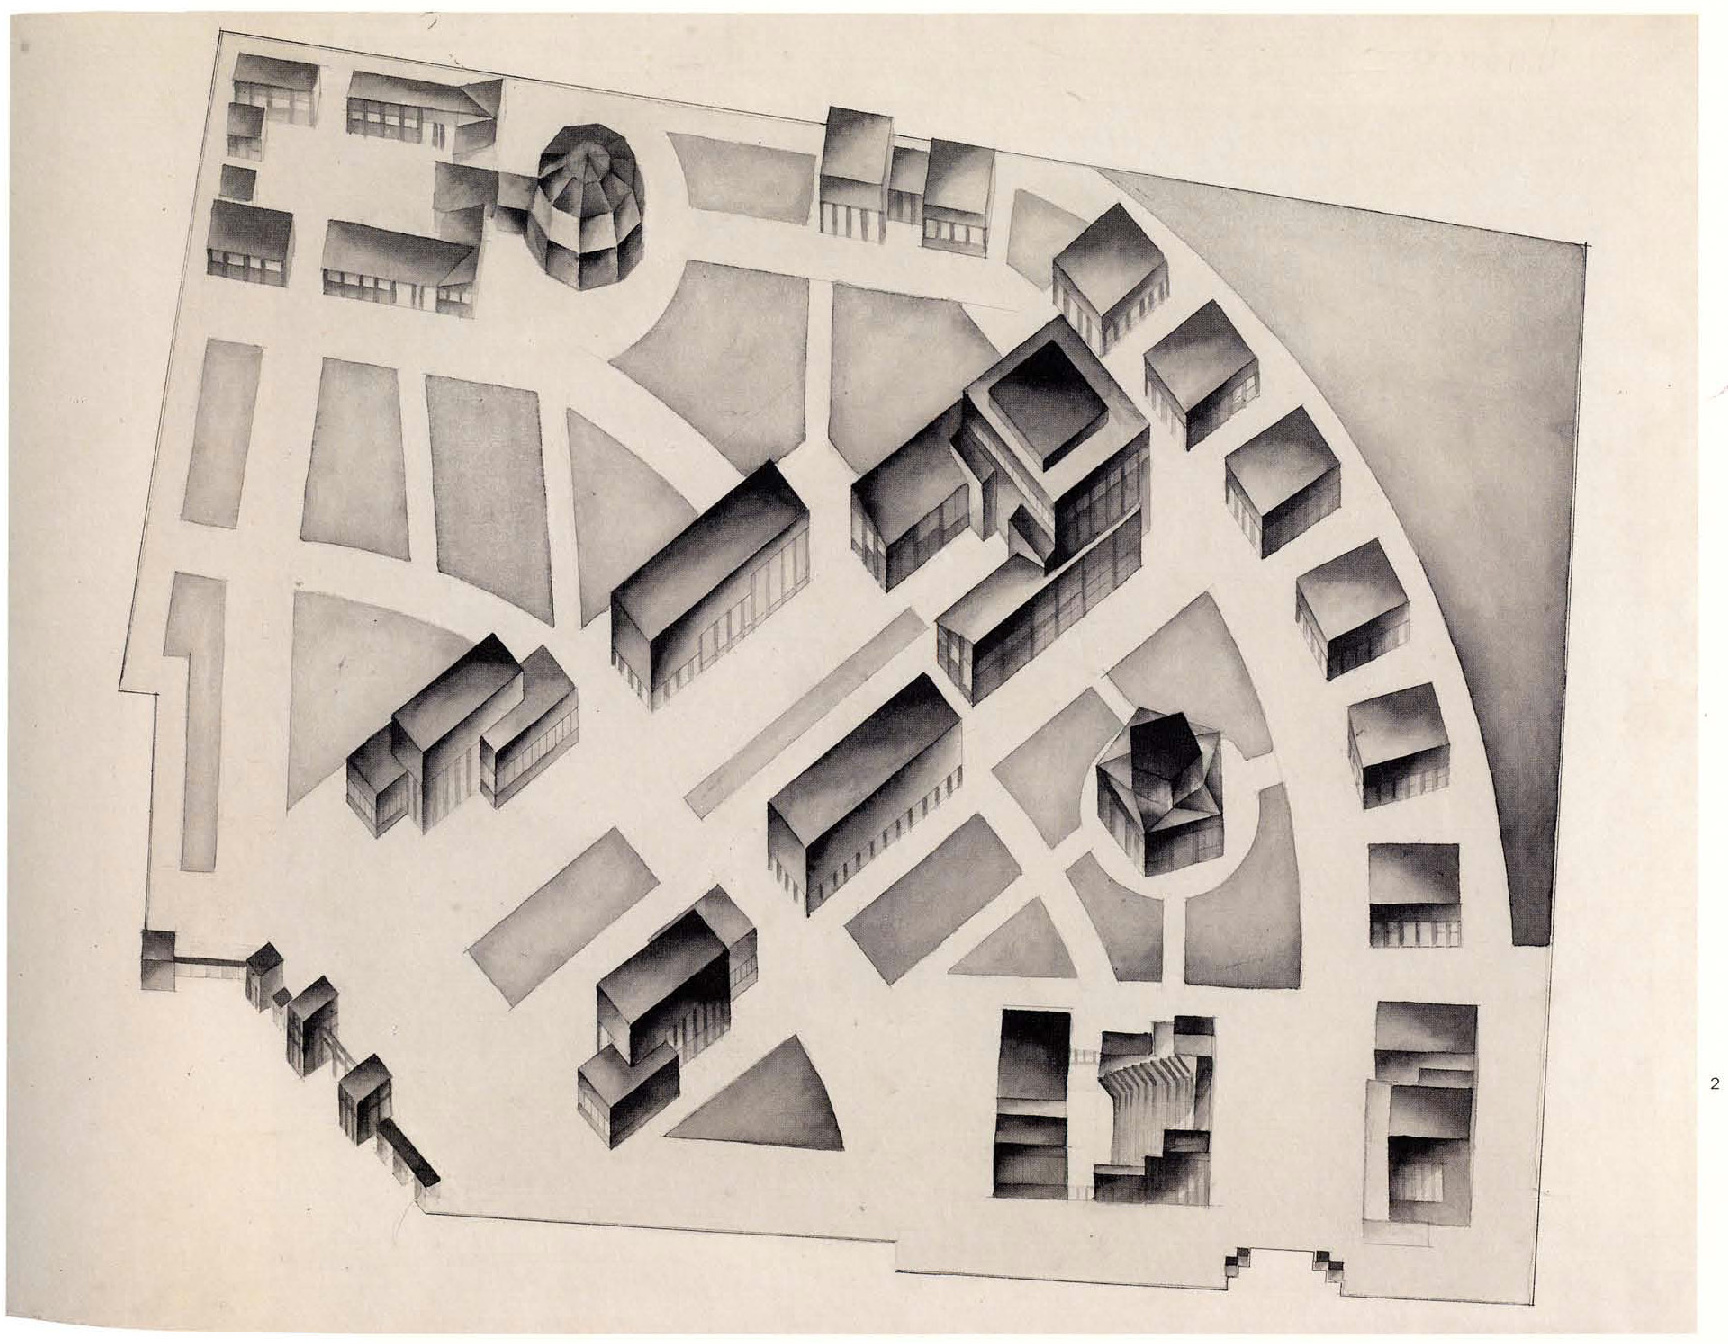 N Umanskii, A Poliakov's workshop, handicraft and industrial exhibition 3rd year 1924 Vkhutemas1